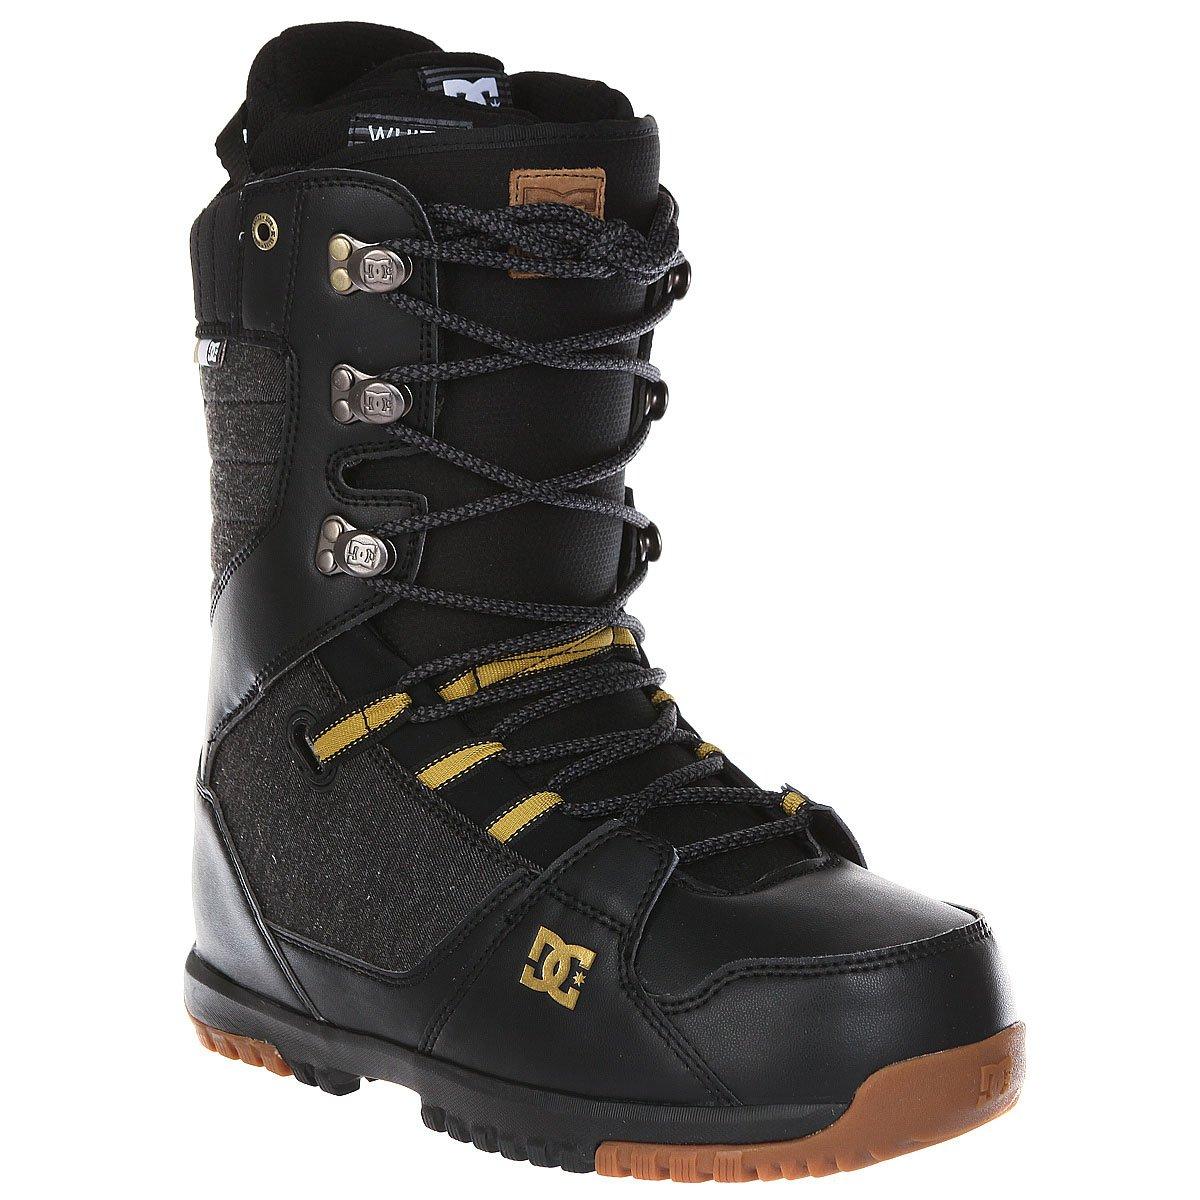 Купить ботинки для сноуборда DC Mutiny Black Gold (ADYO200031-BG3) в  интернет-магазине Proskater.by 342c8384309